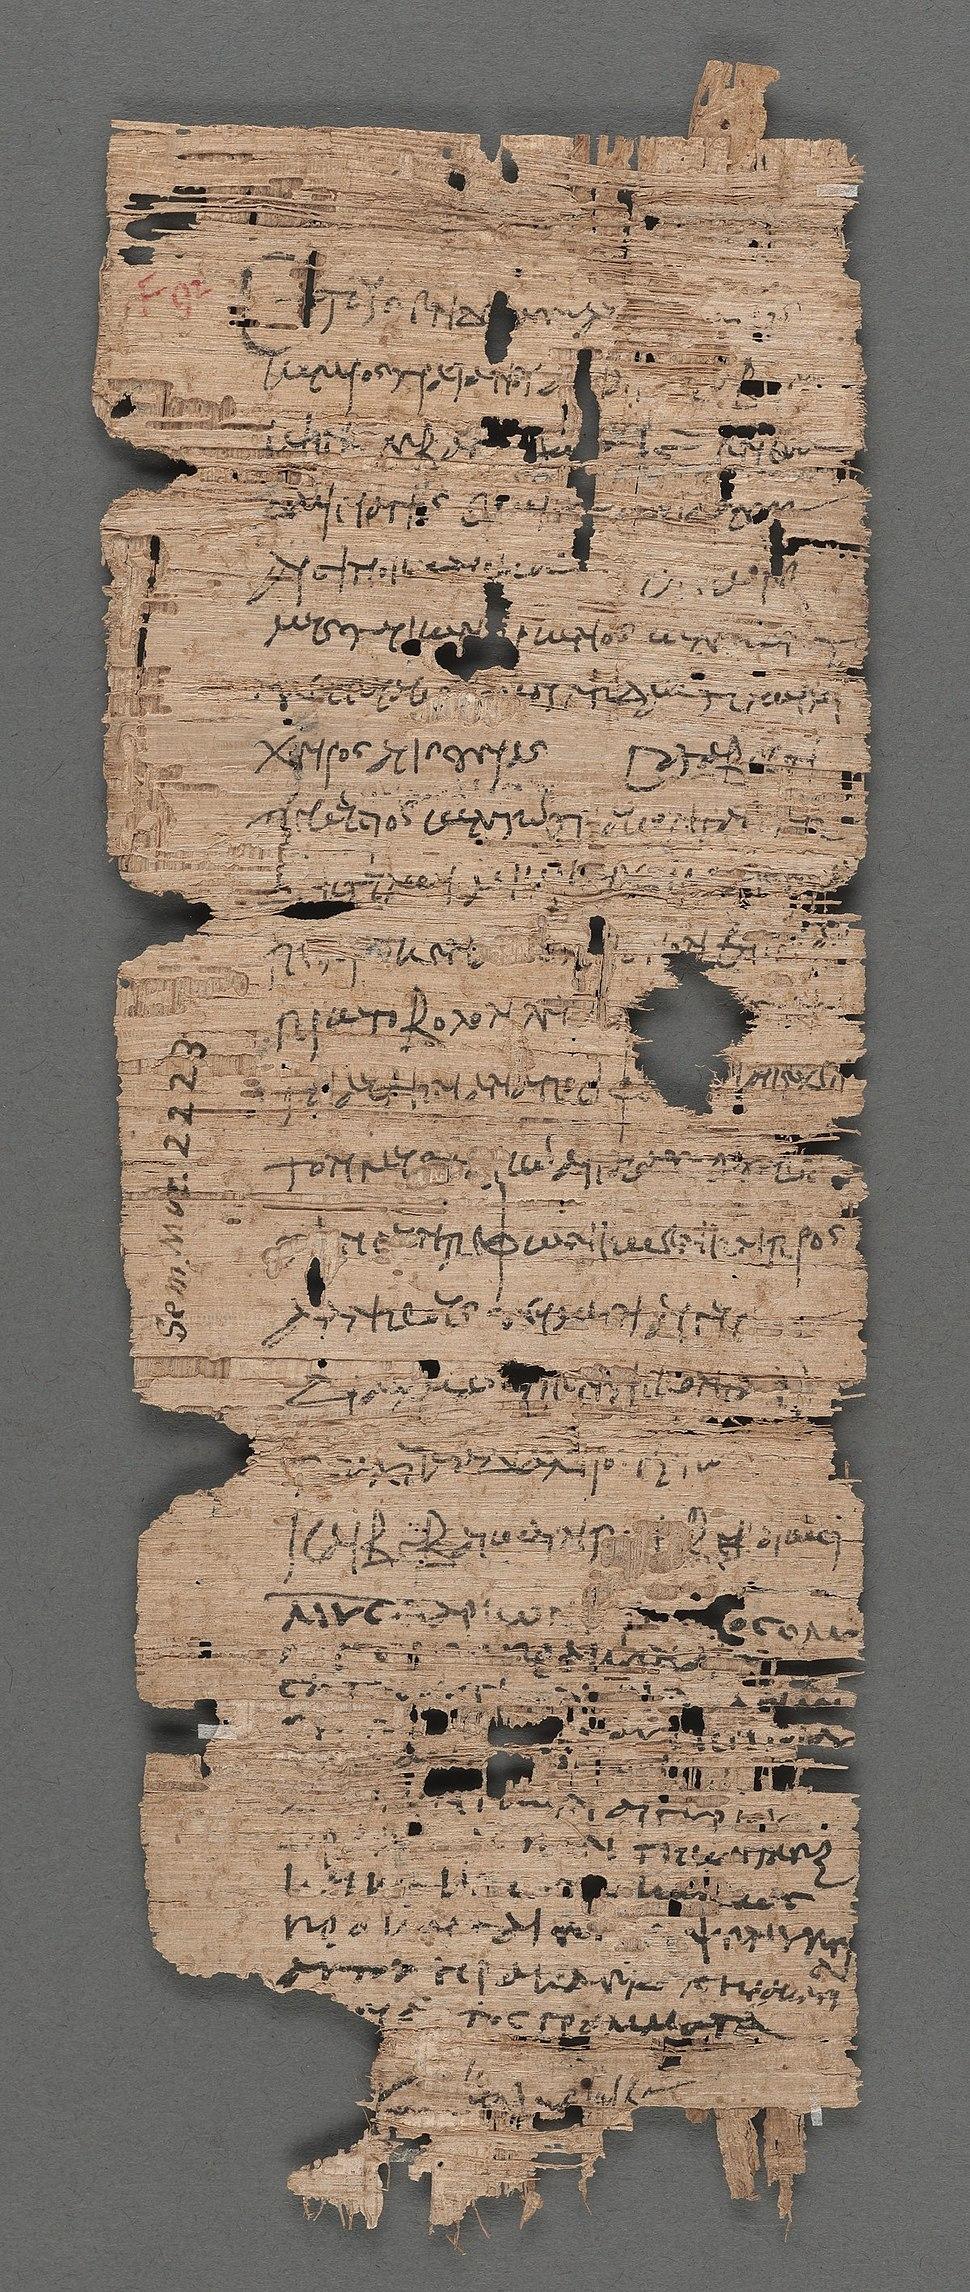 Papyrus bill of sale donkey